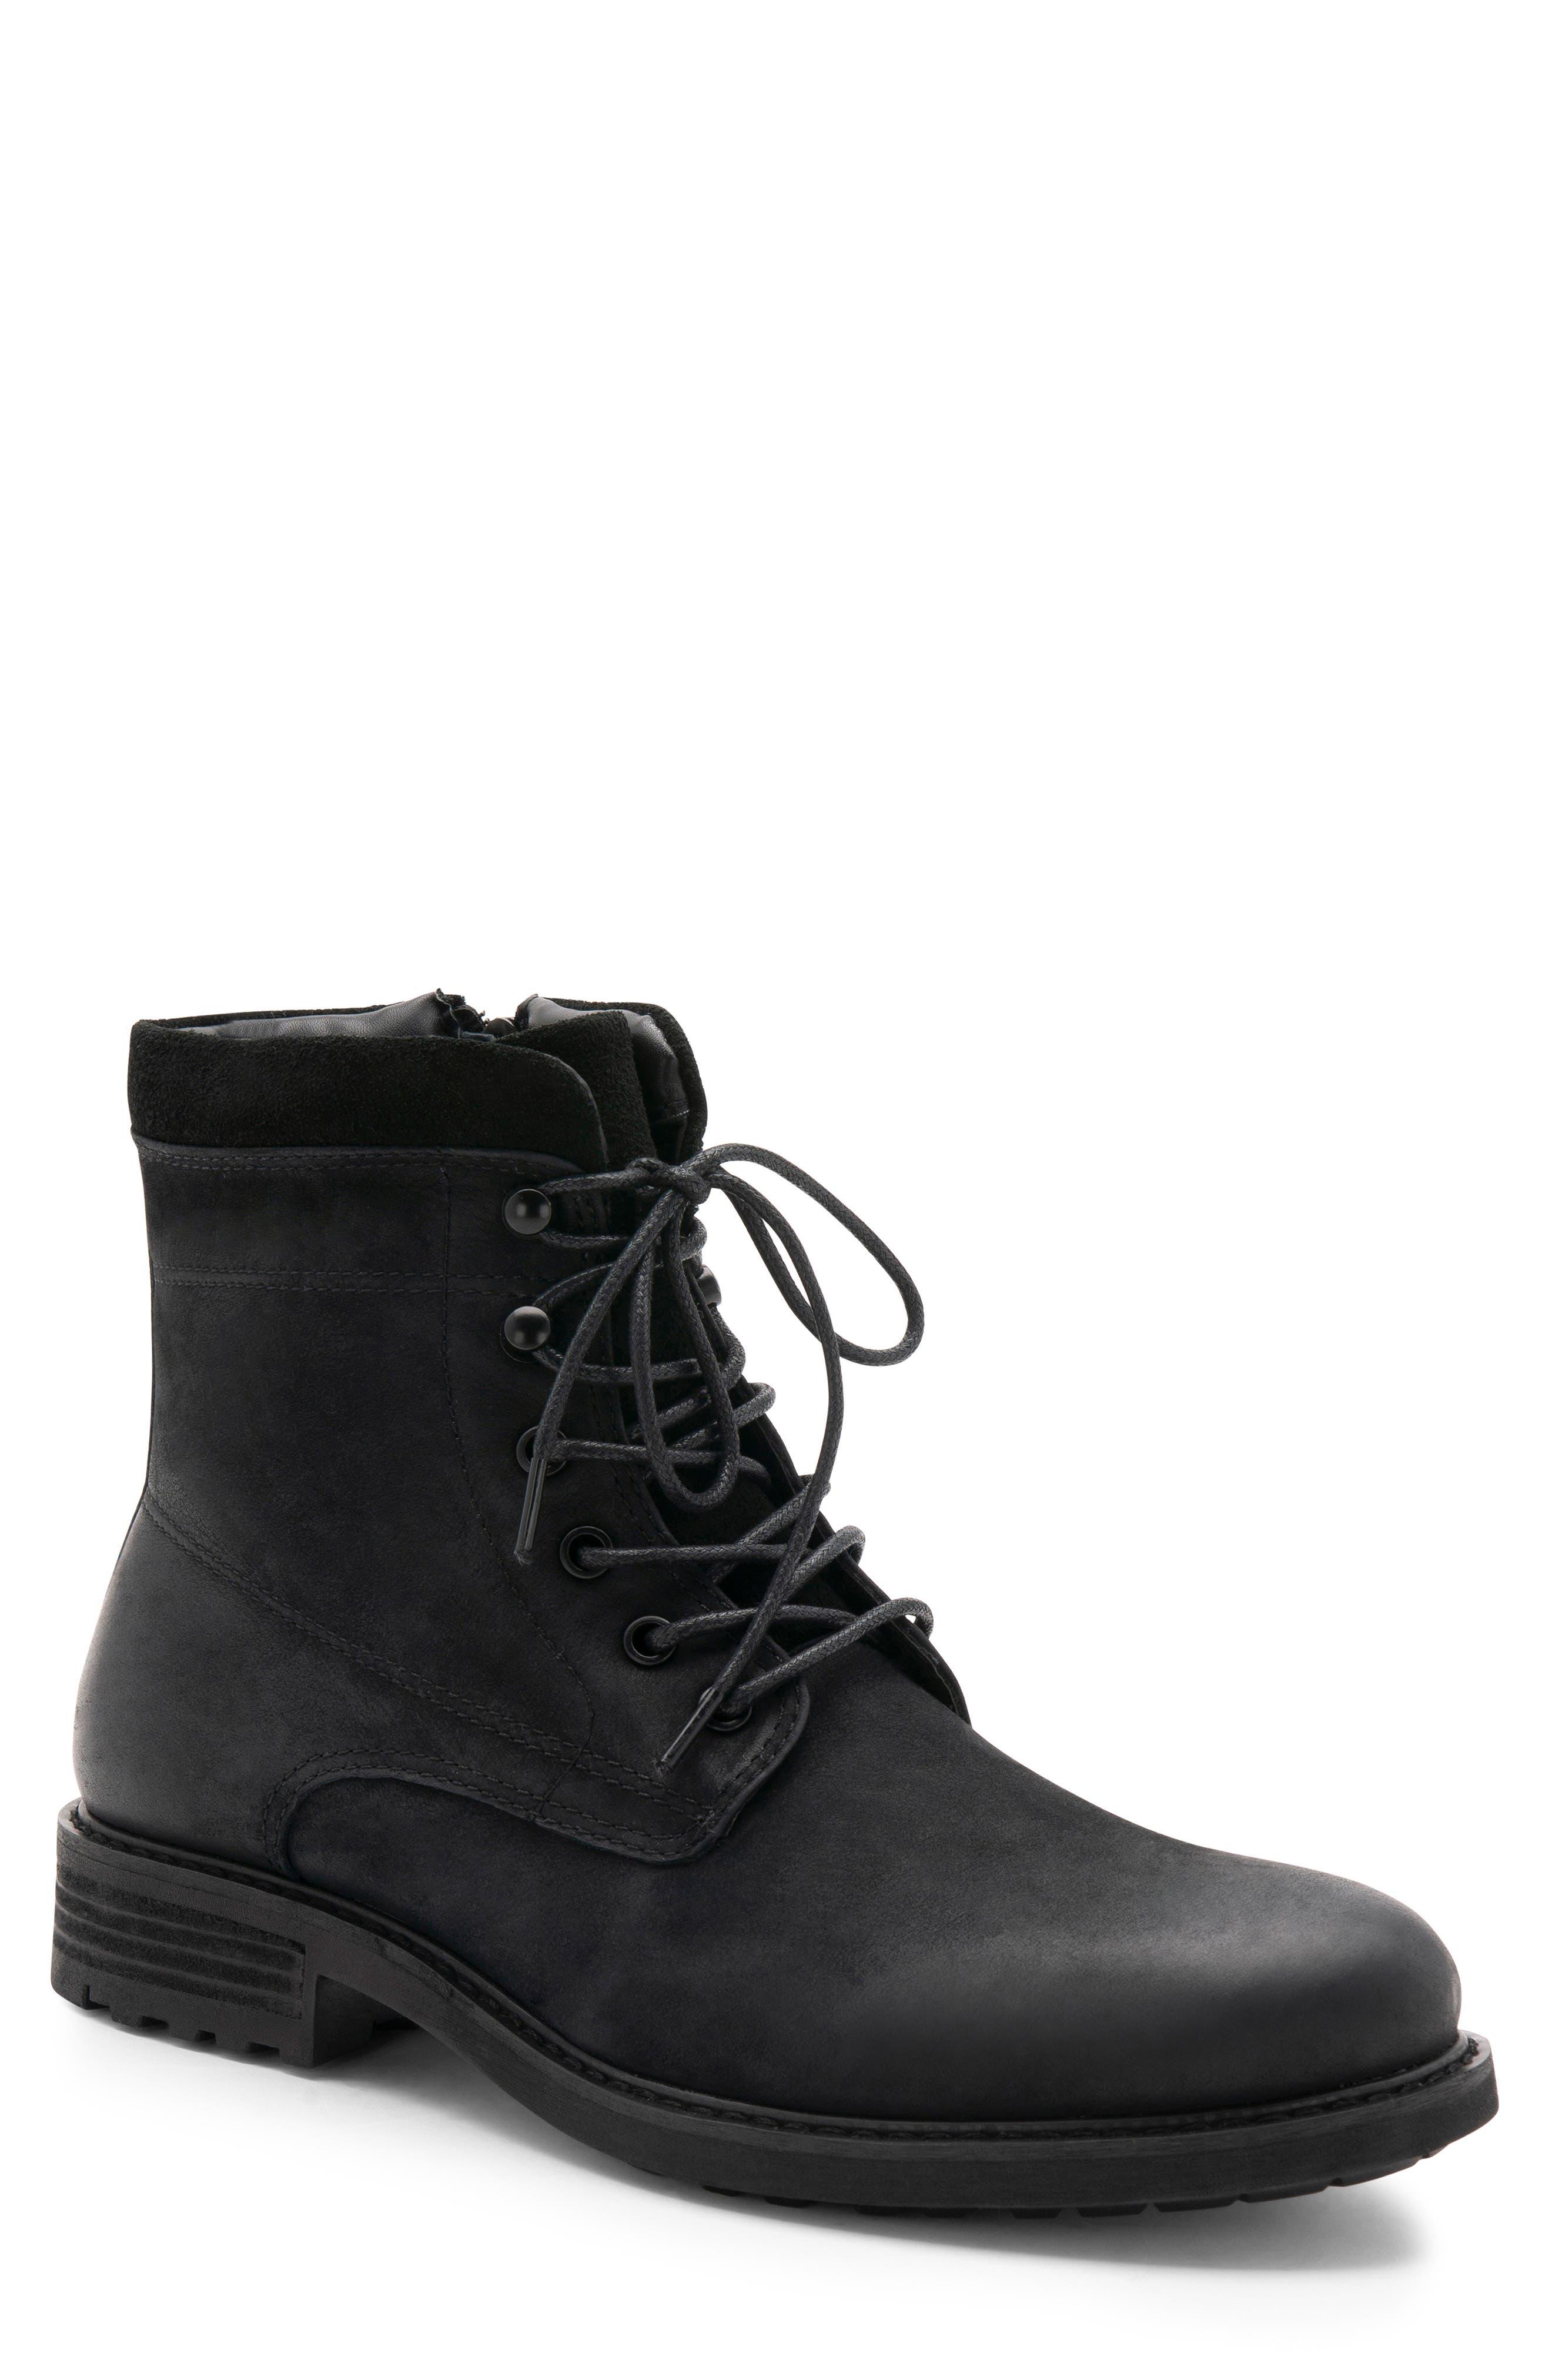 Blondo Patton Waterproof Plain Toe Boot- Black